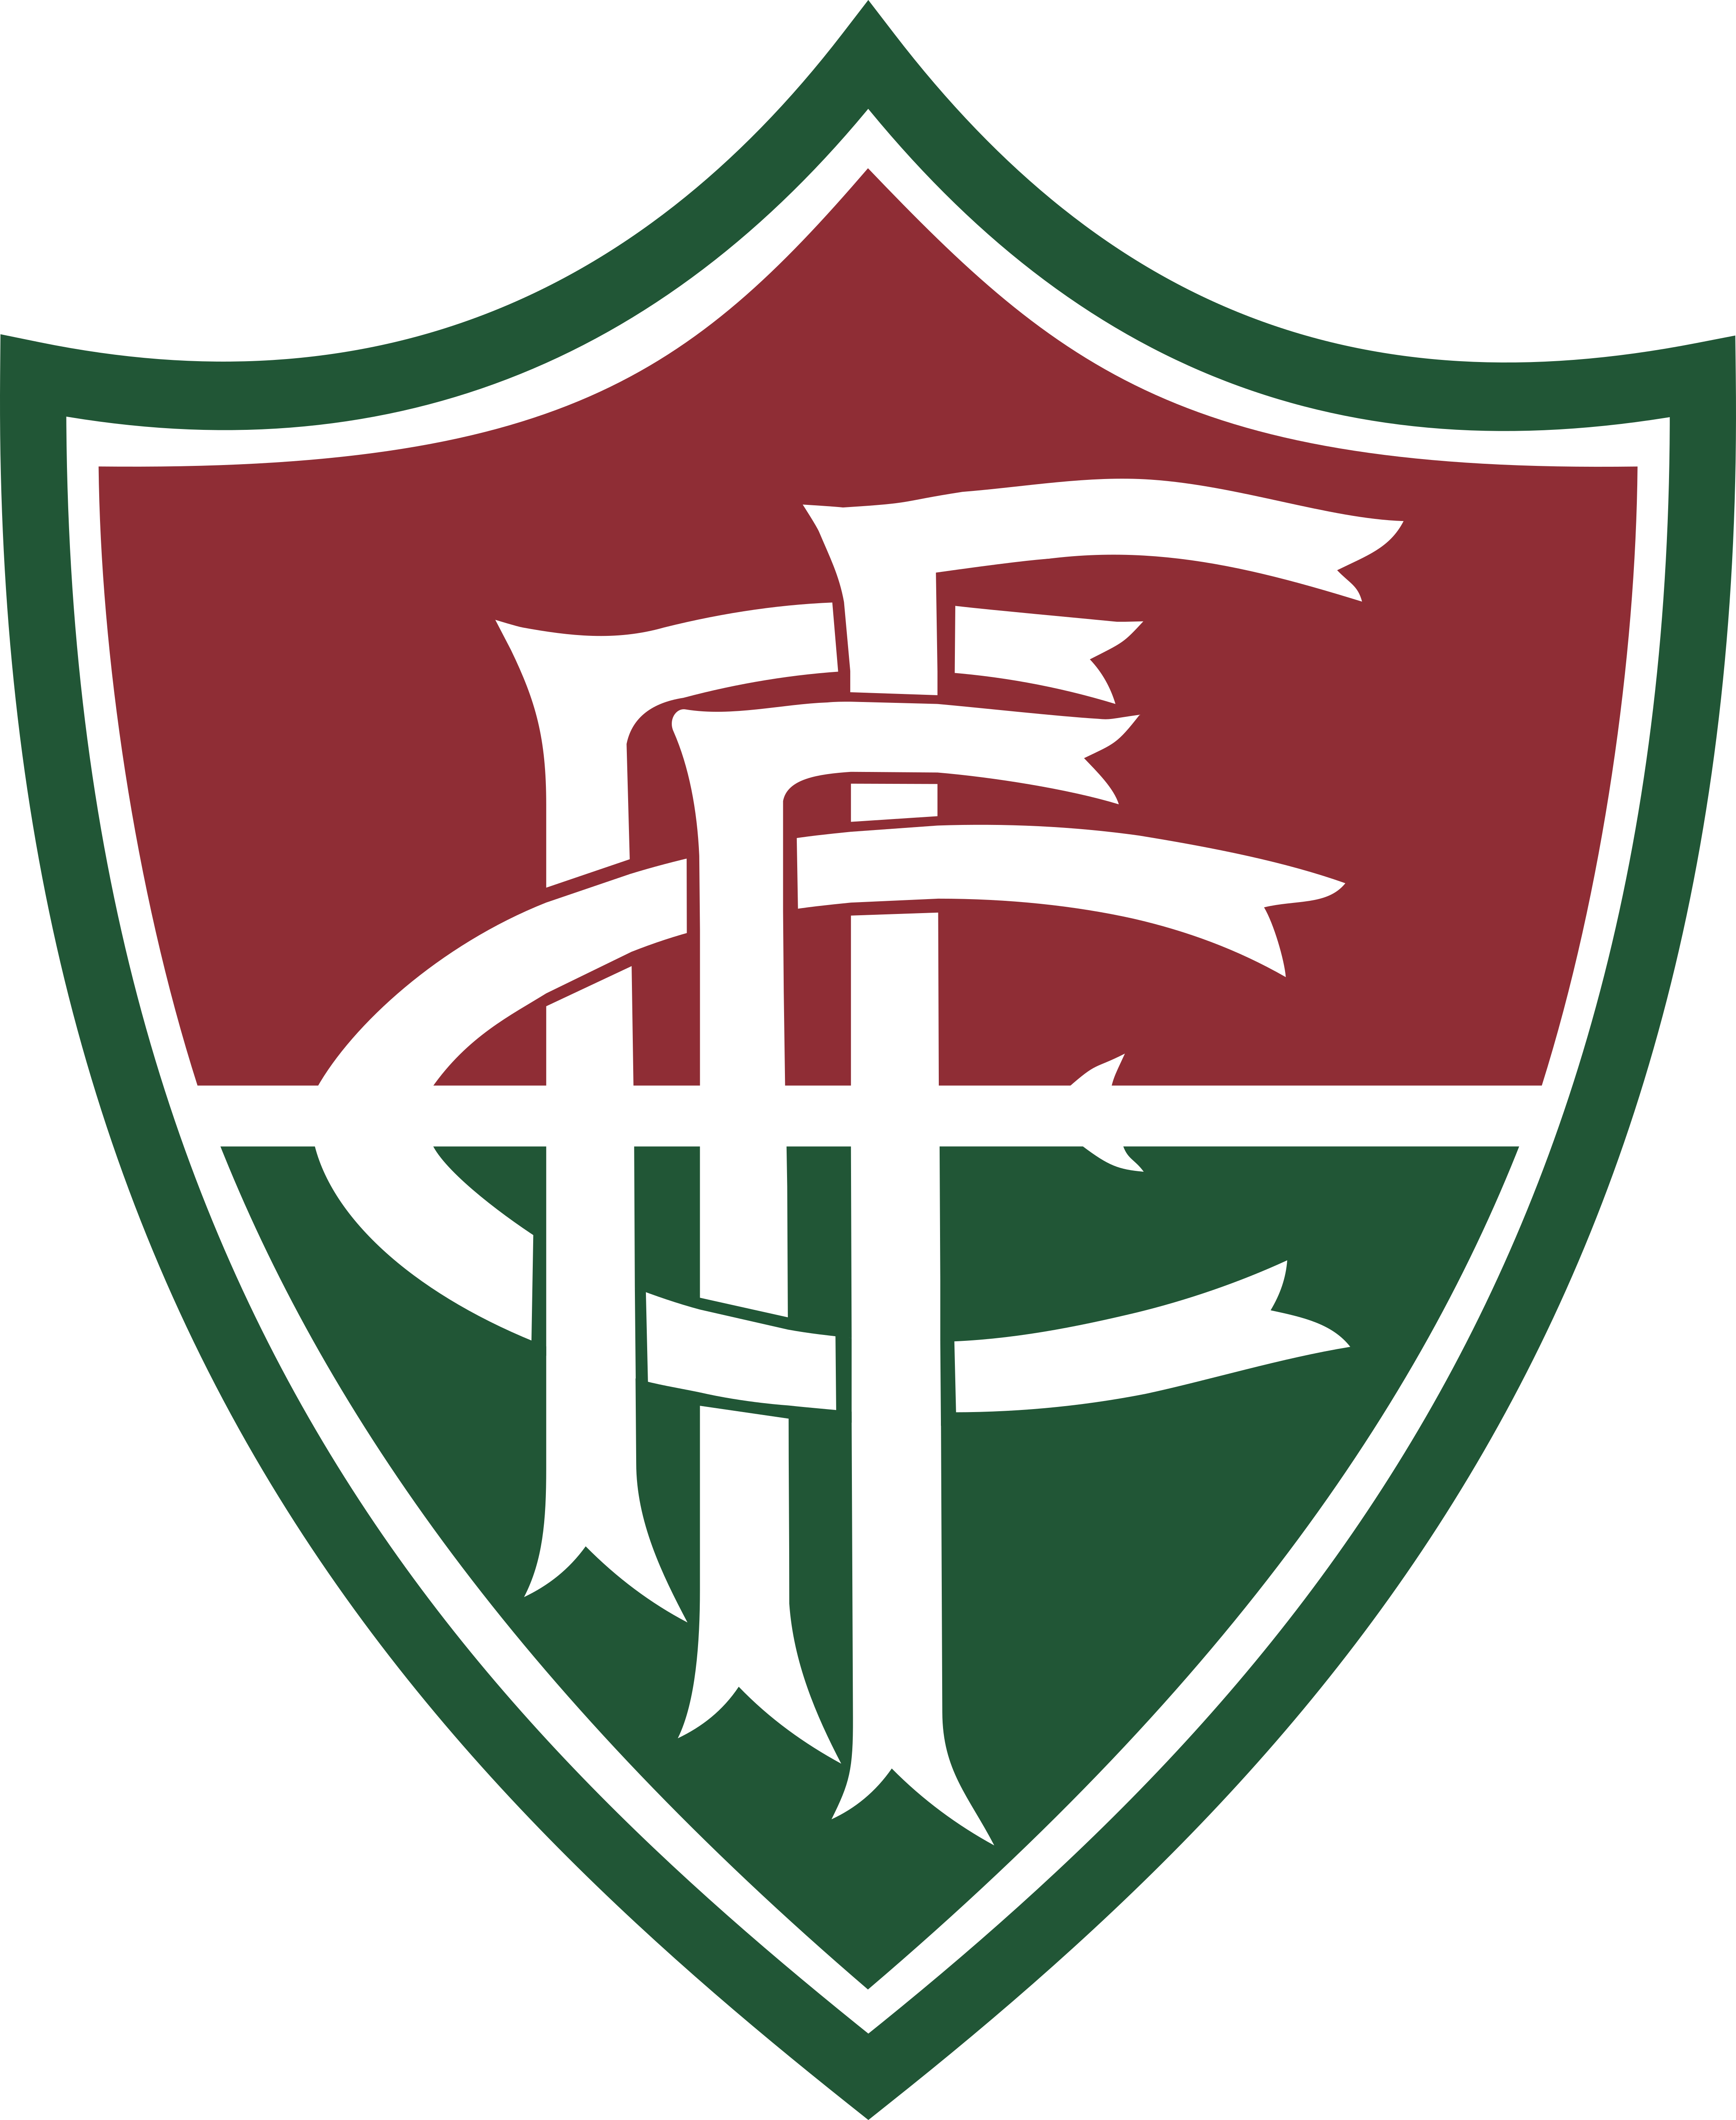 fluminense de feira logo 1 - Fluminense de Feira FC Logo